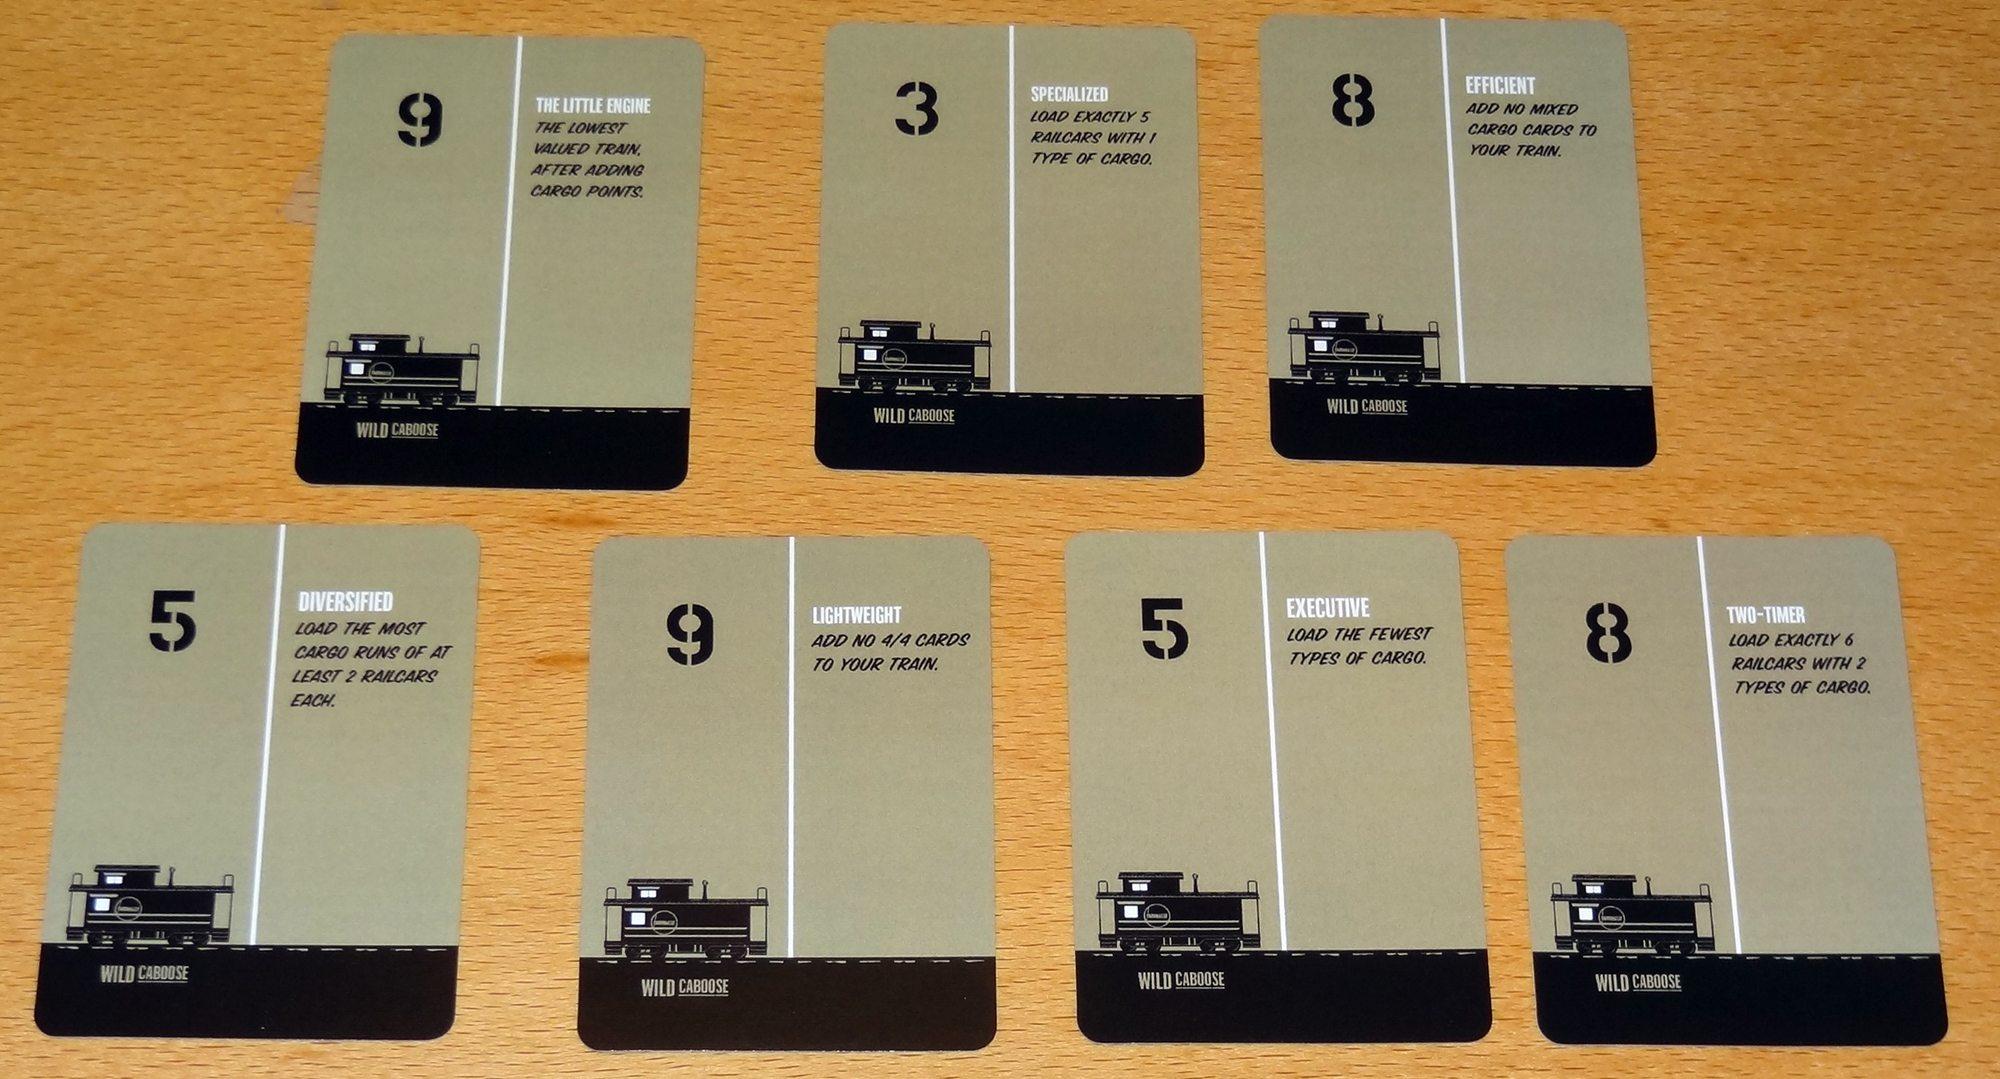 Yardmaster Express Caboose cards